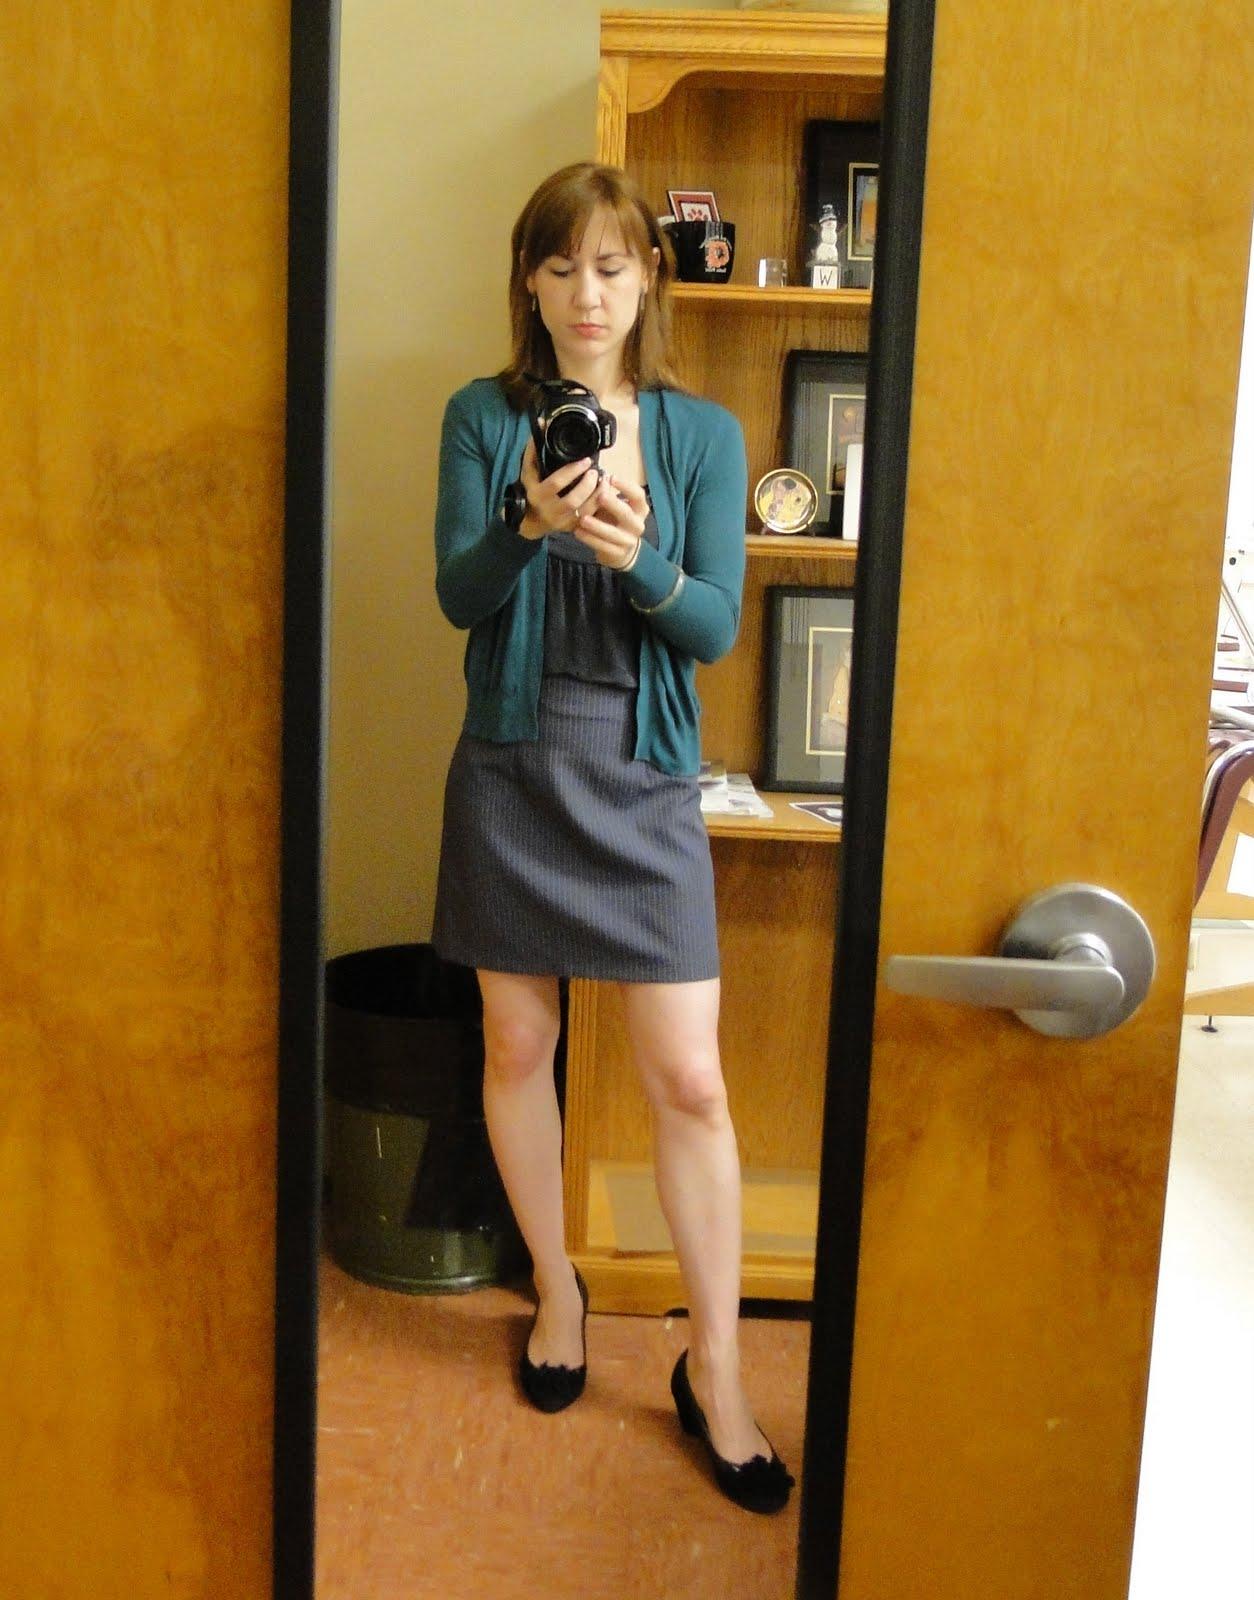 Megyn price elevator dress